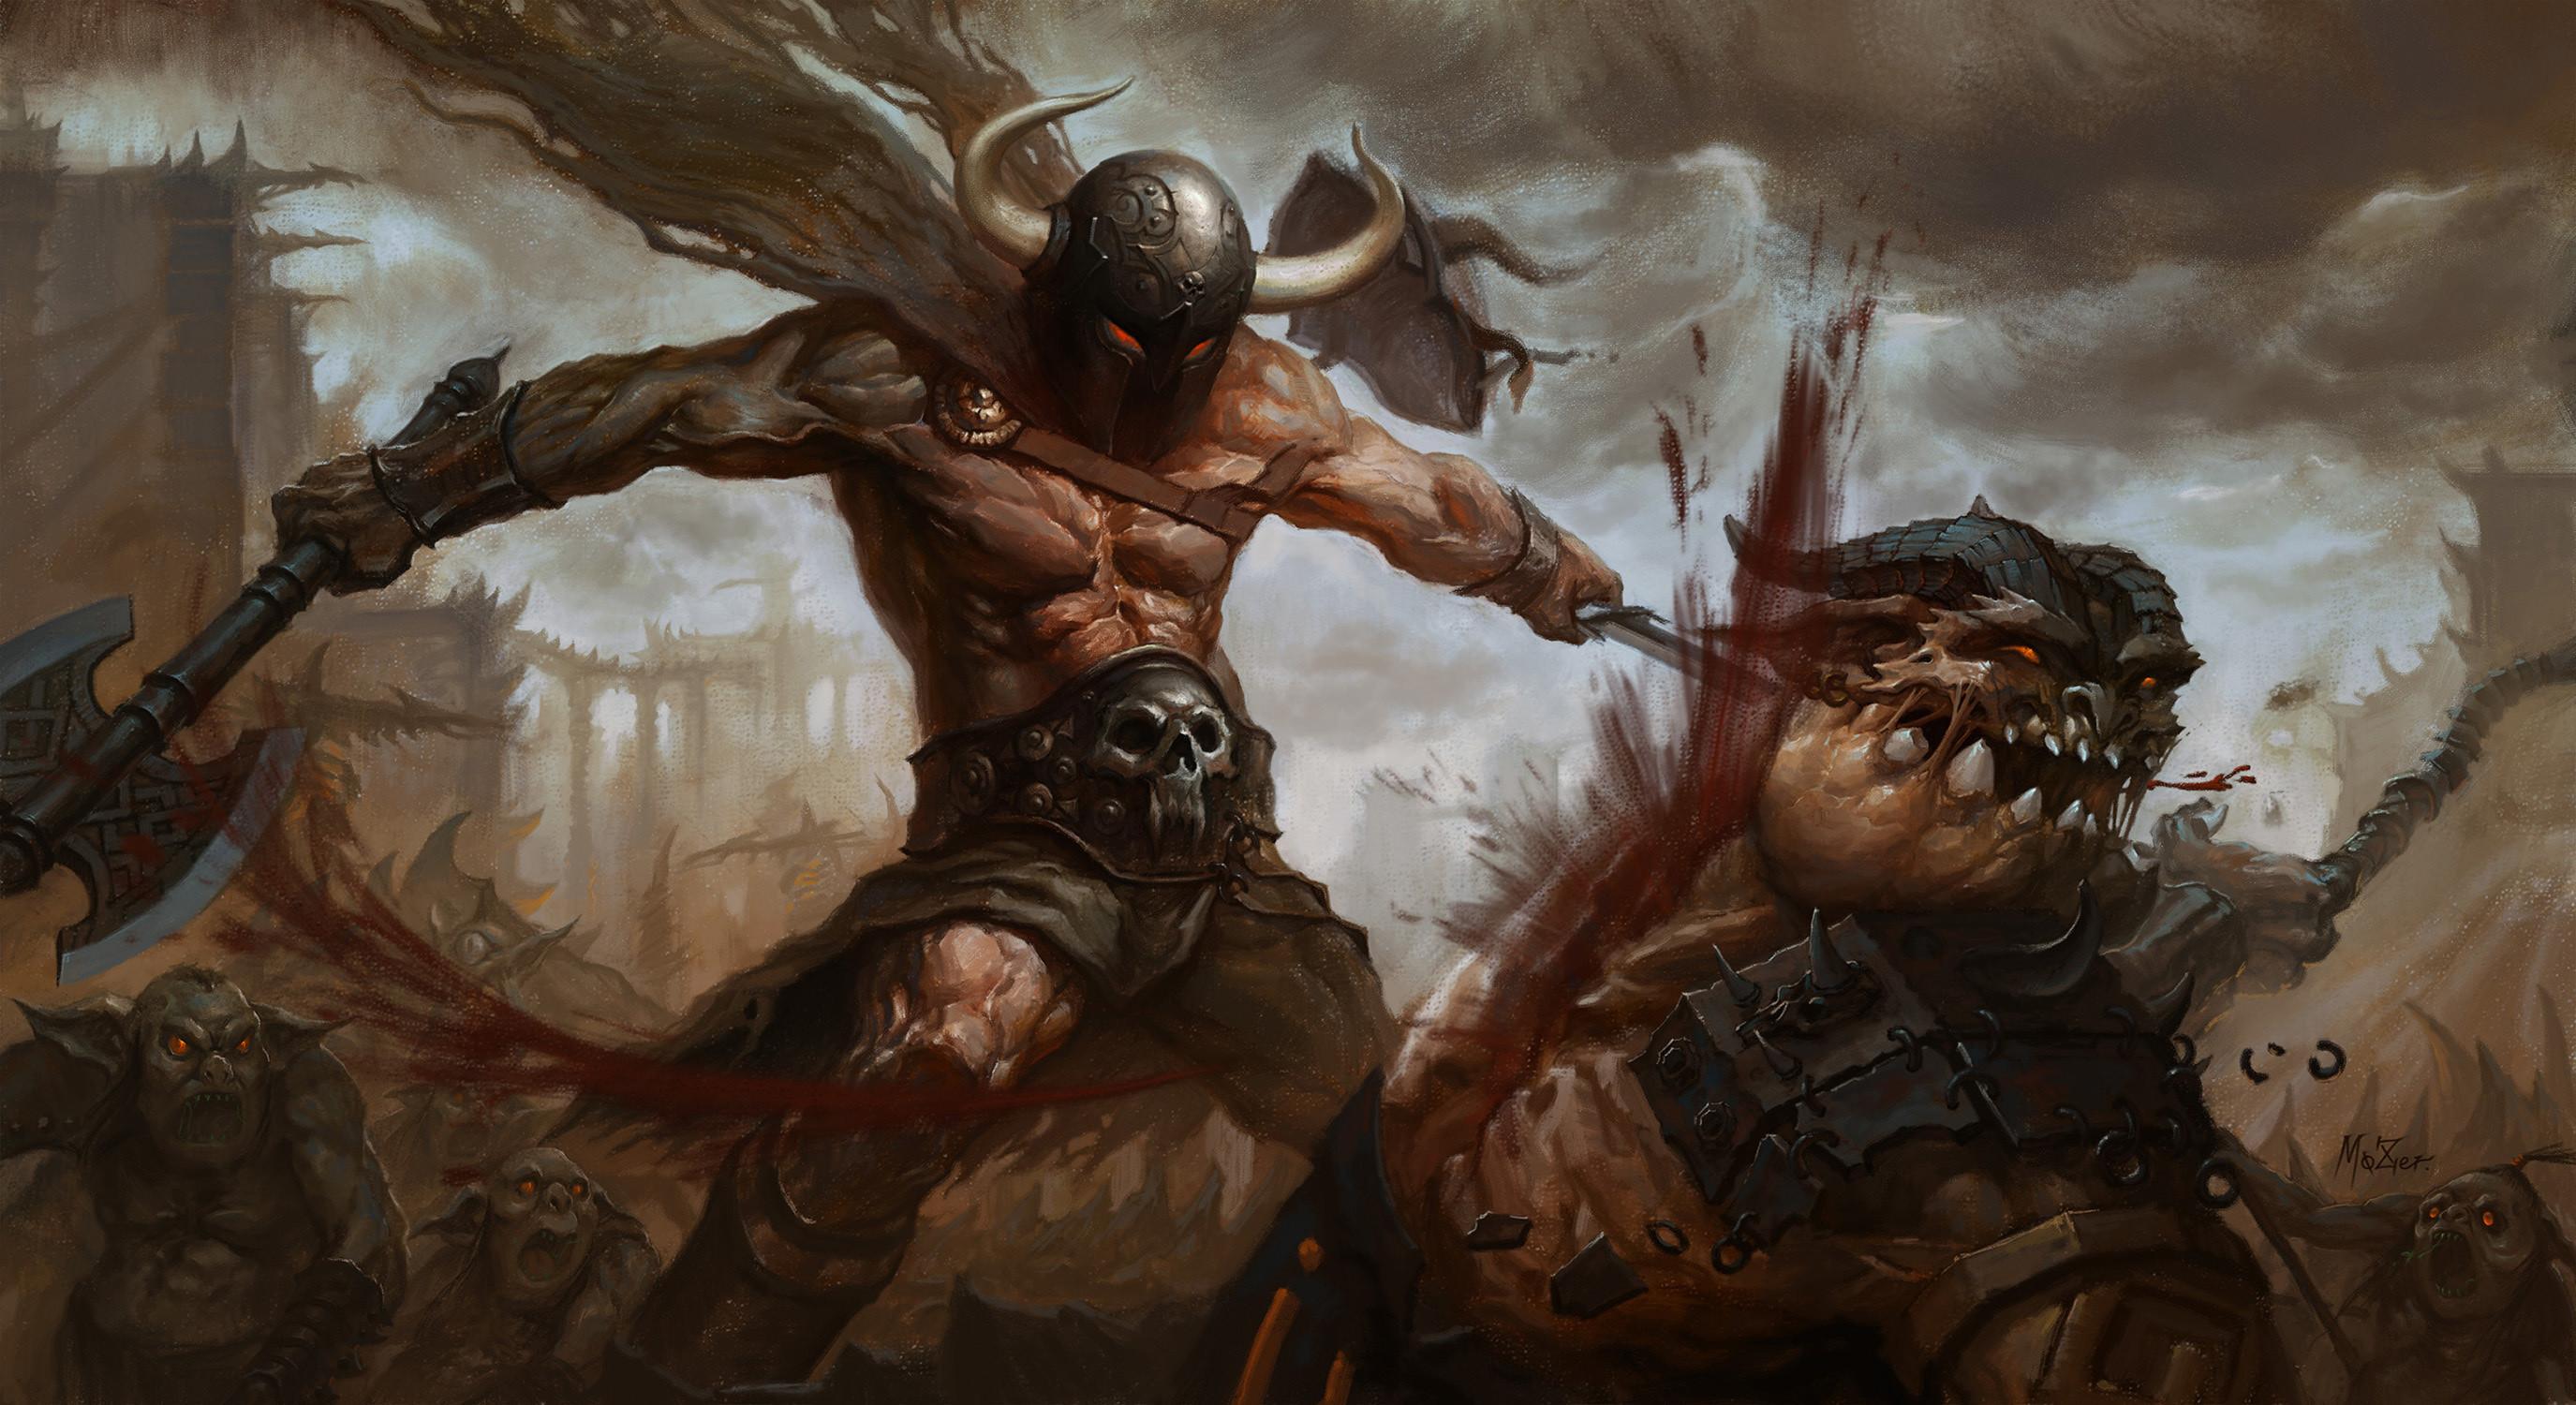 vikings wallpaper blood   Text: Viking Battle for Asgard video fantasy  warrior battle weapons .